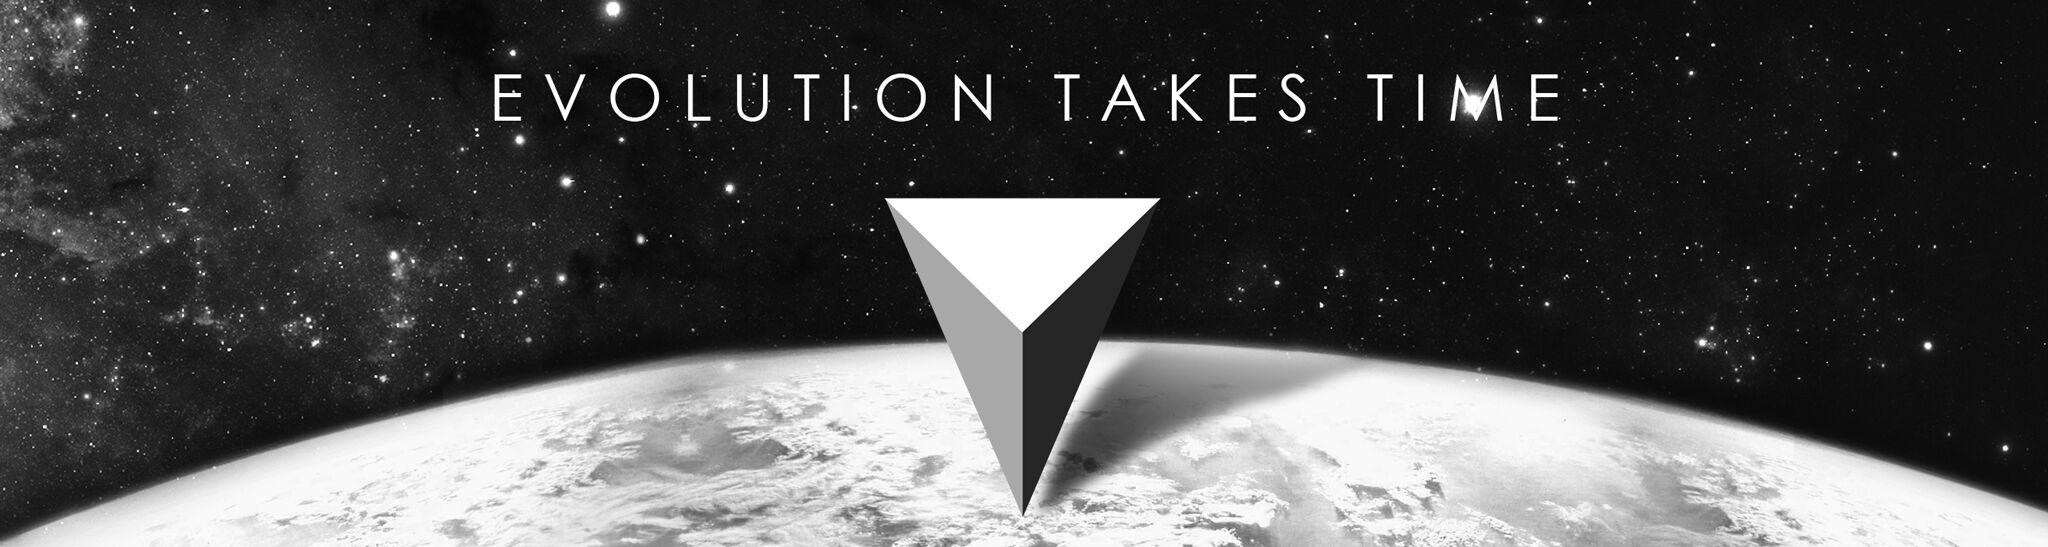 EvolutionTakesTime_preview.jpeg